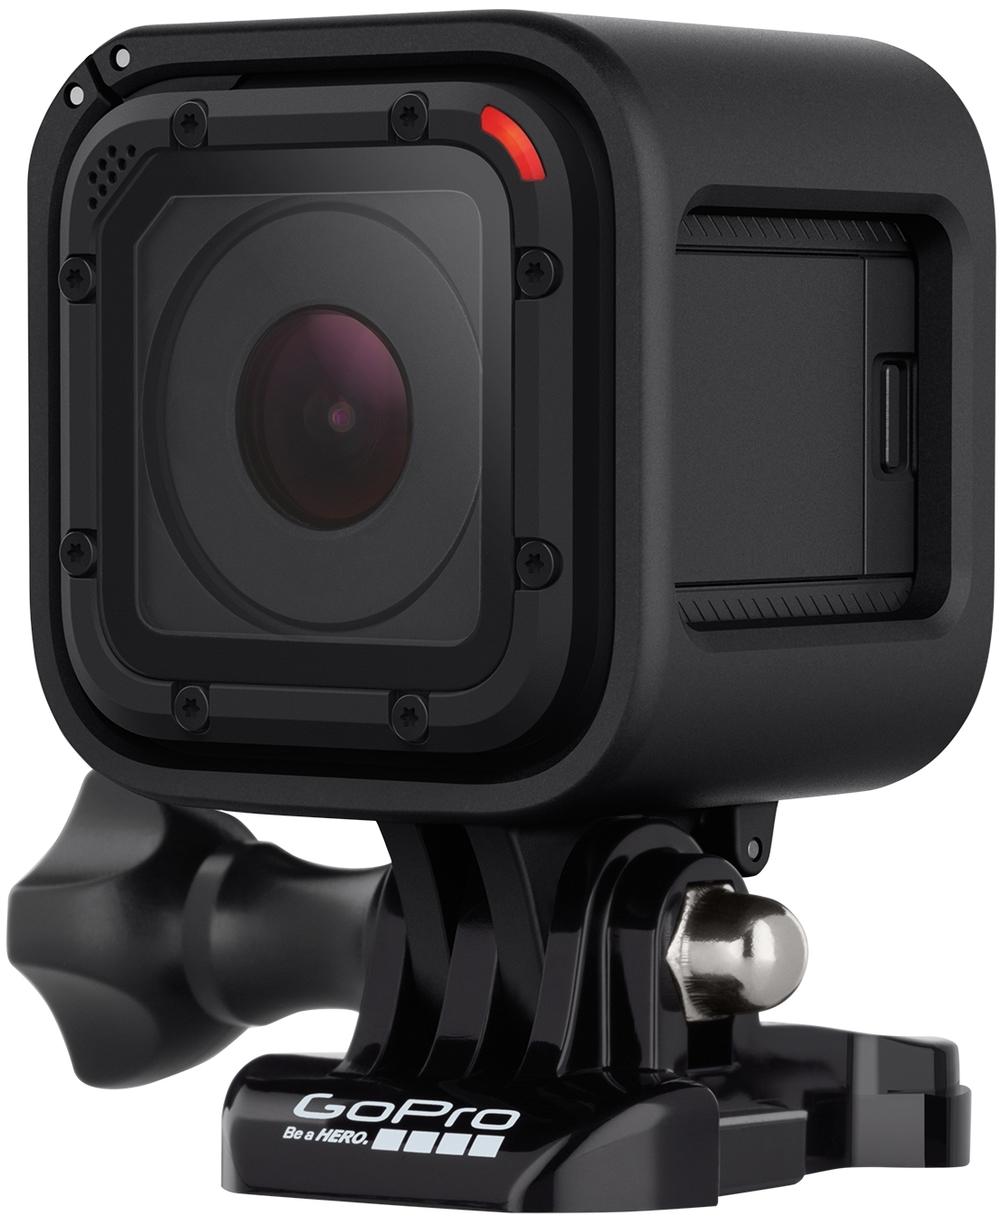 GoPro HERO4 Session, $300